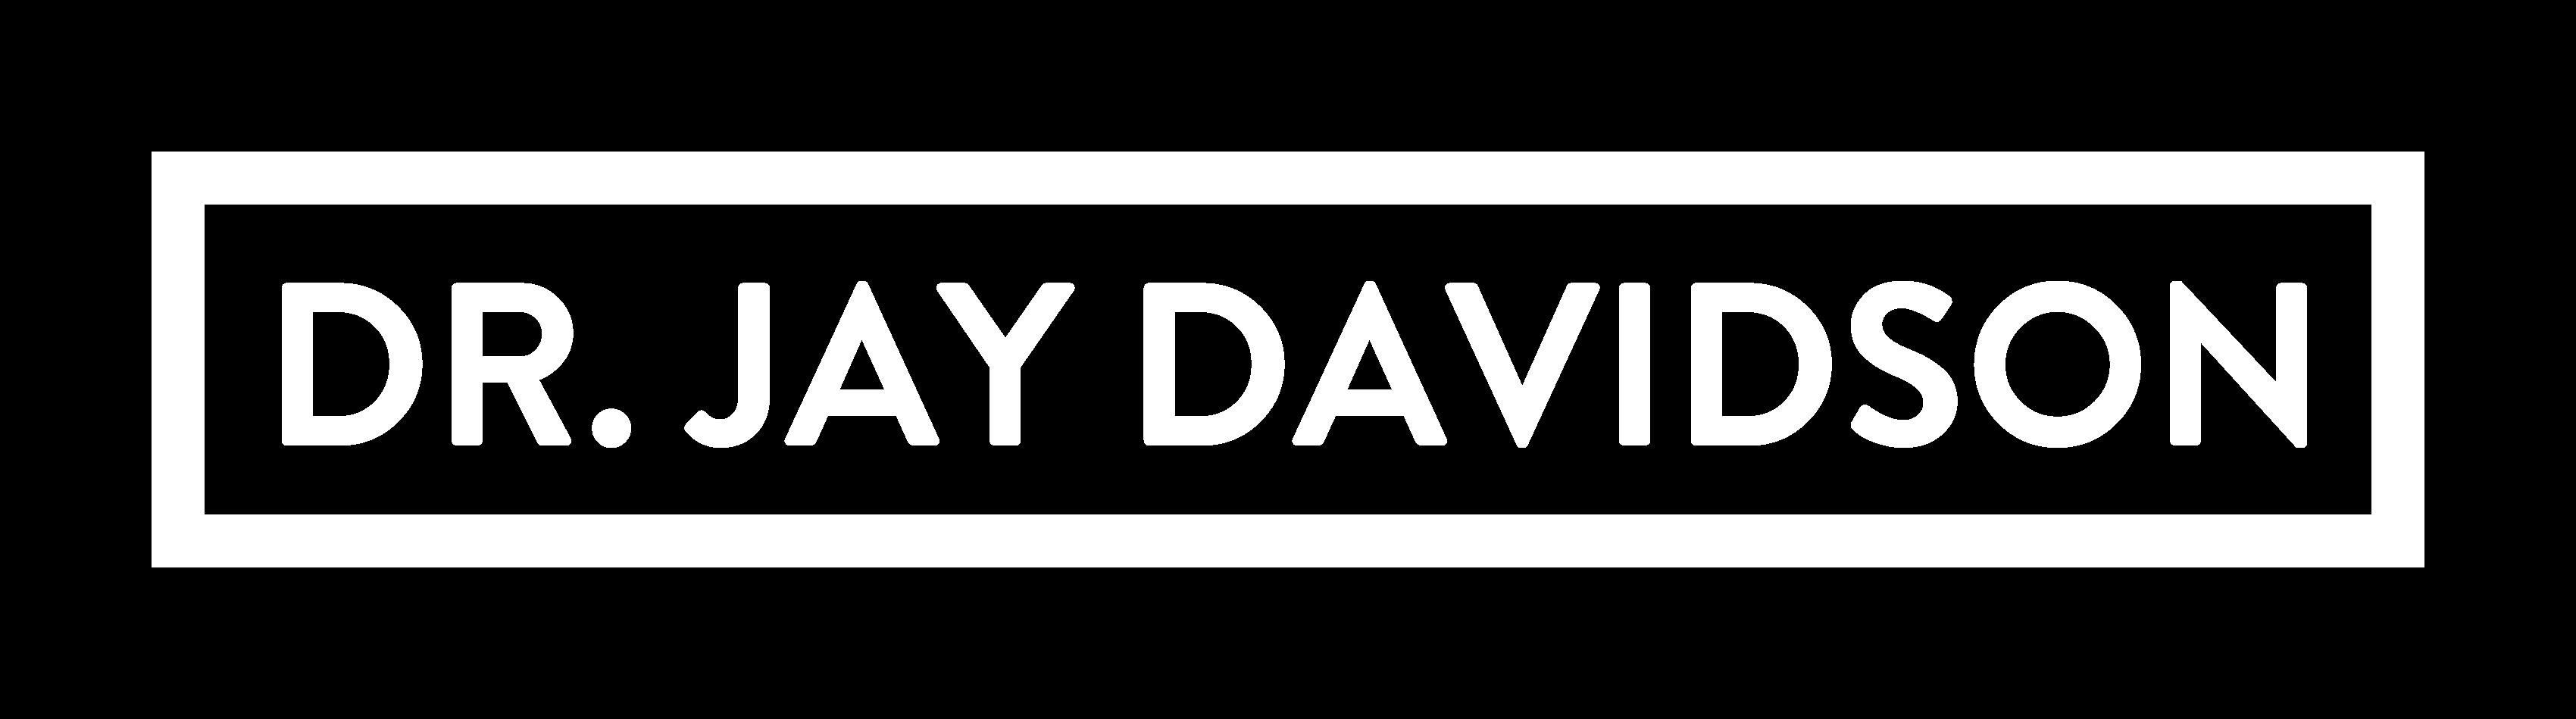 Dr Jay Davidson Logo